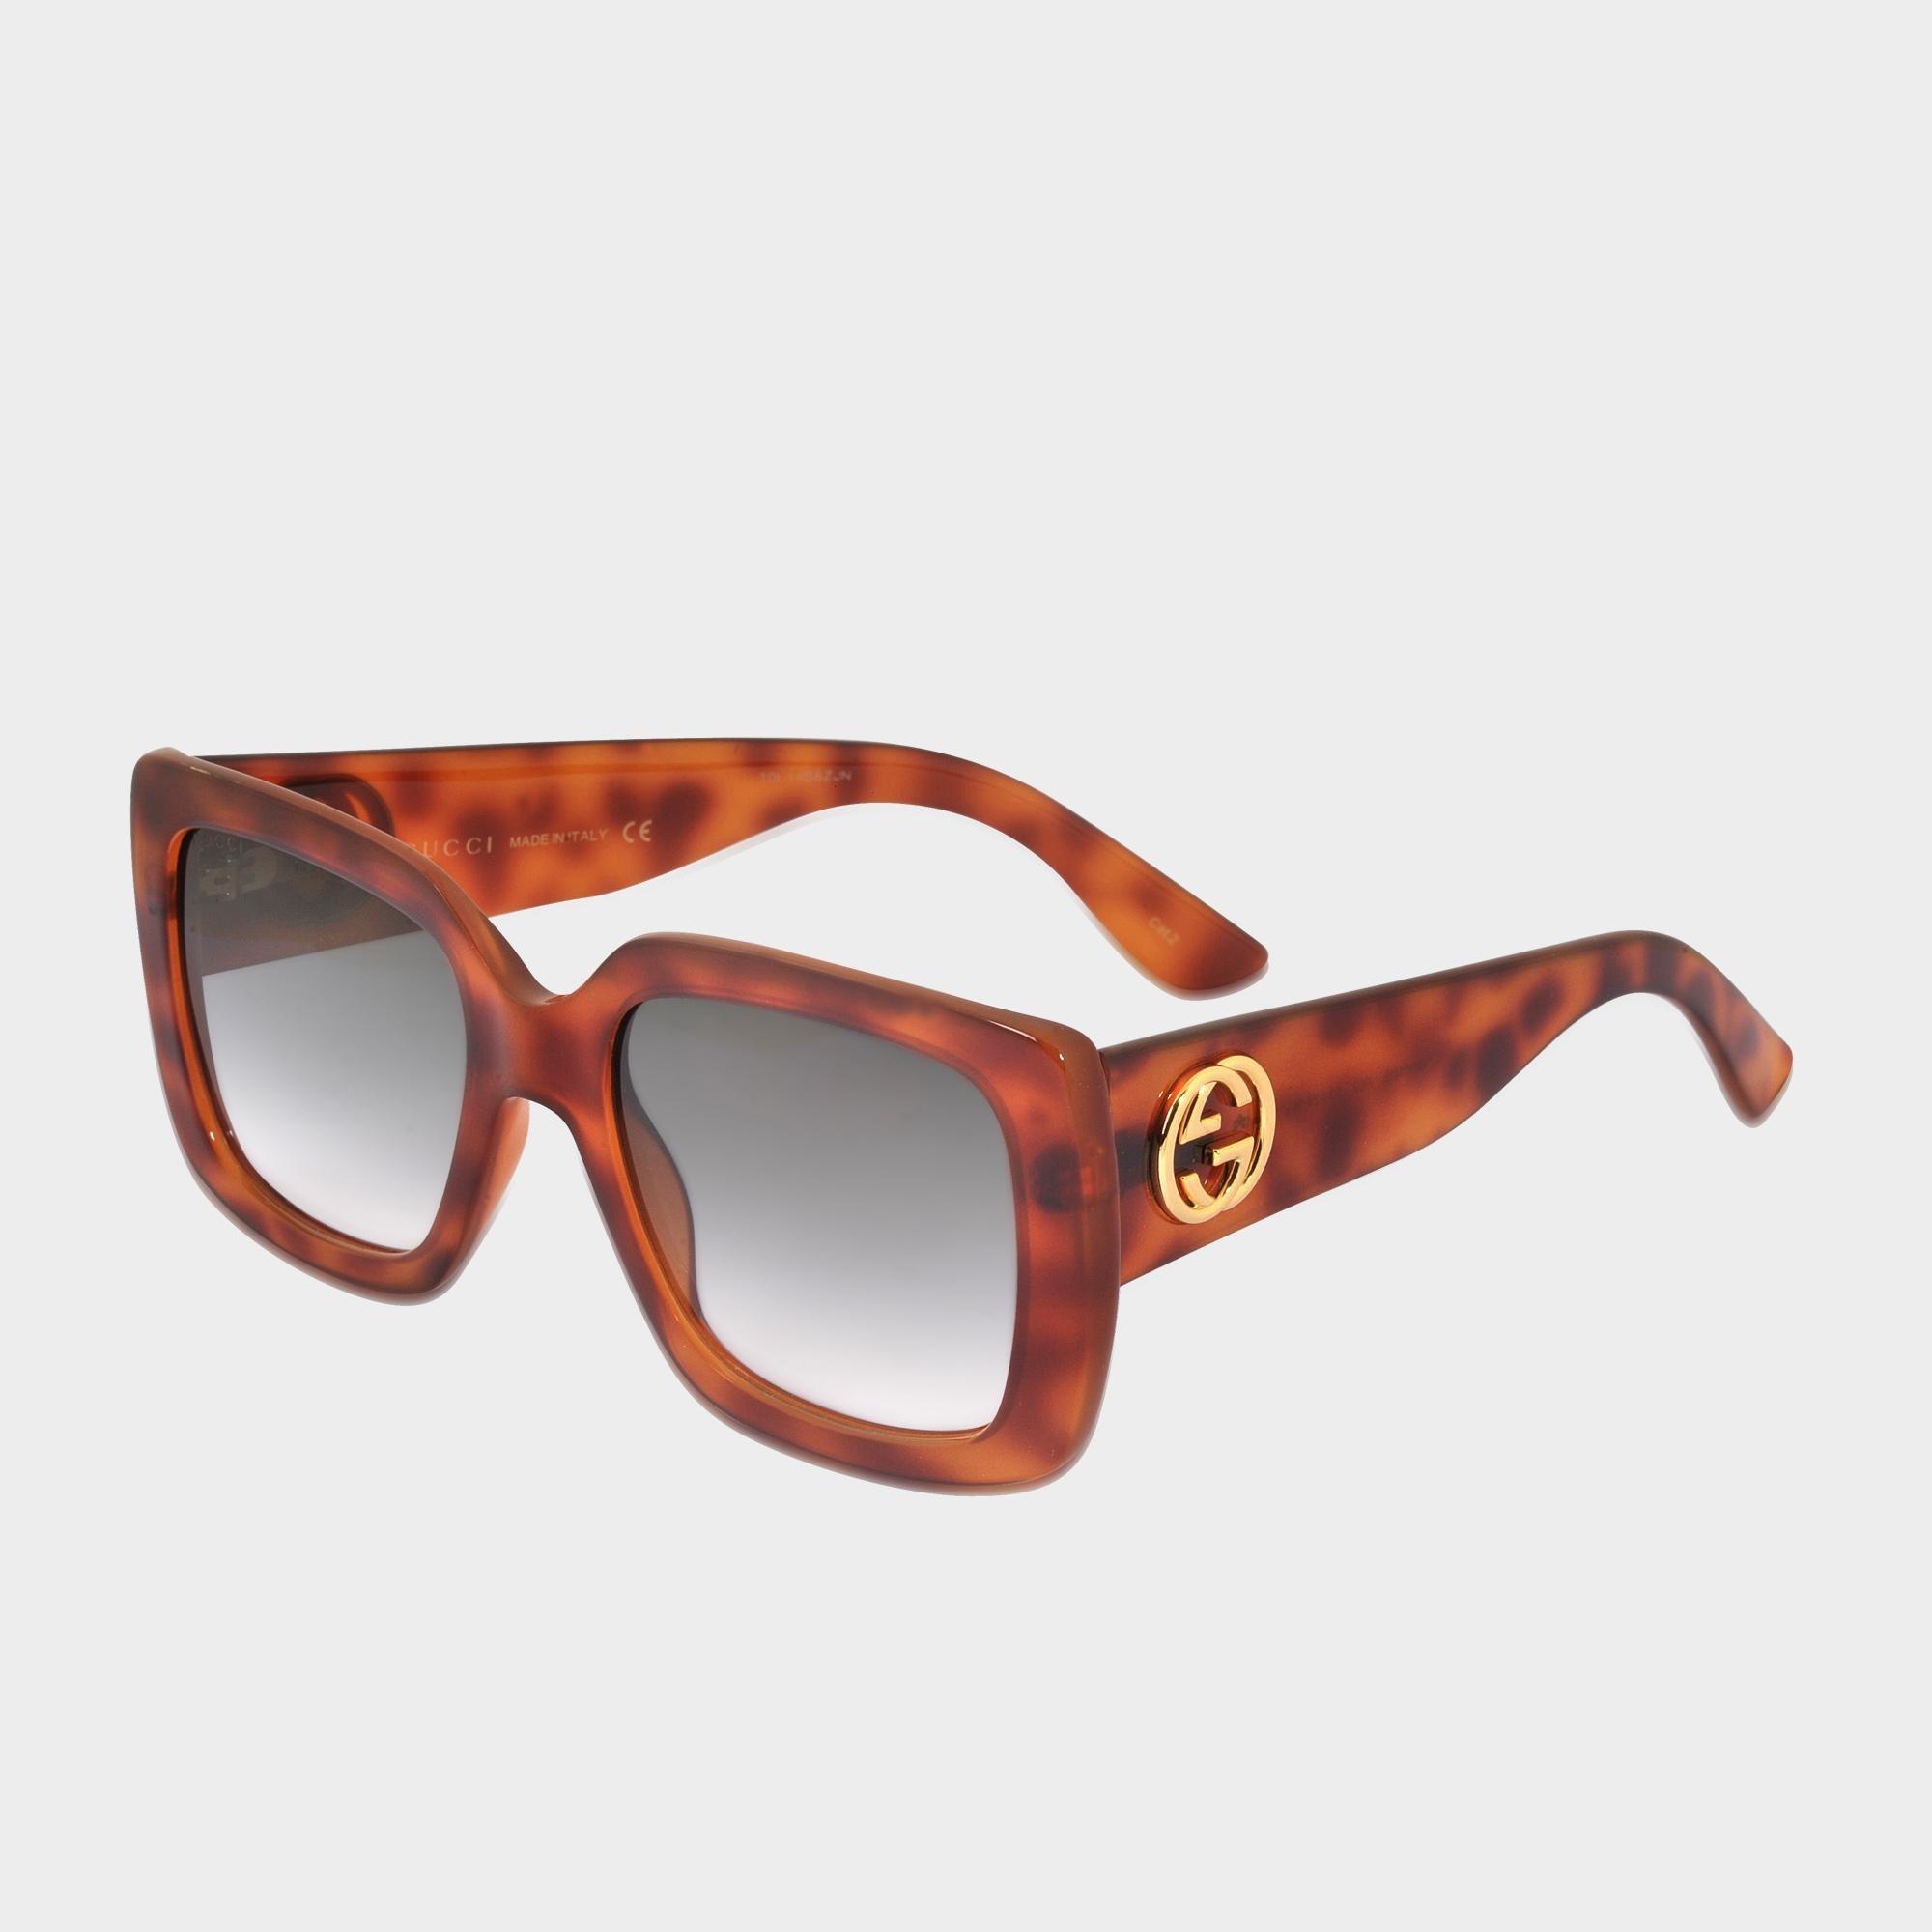 141S Sunglasses Gucci dKdZ9dqR